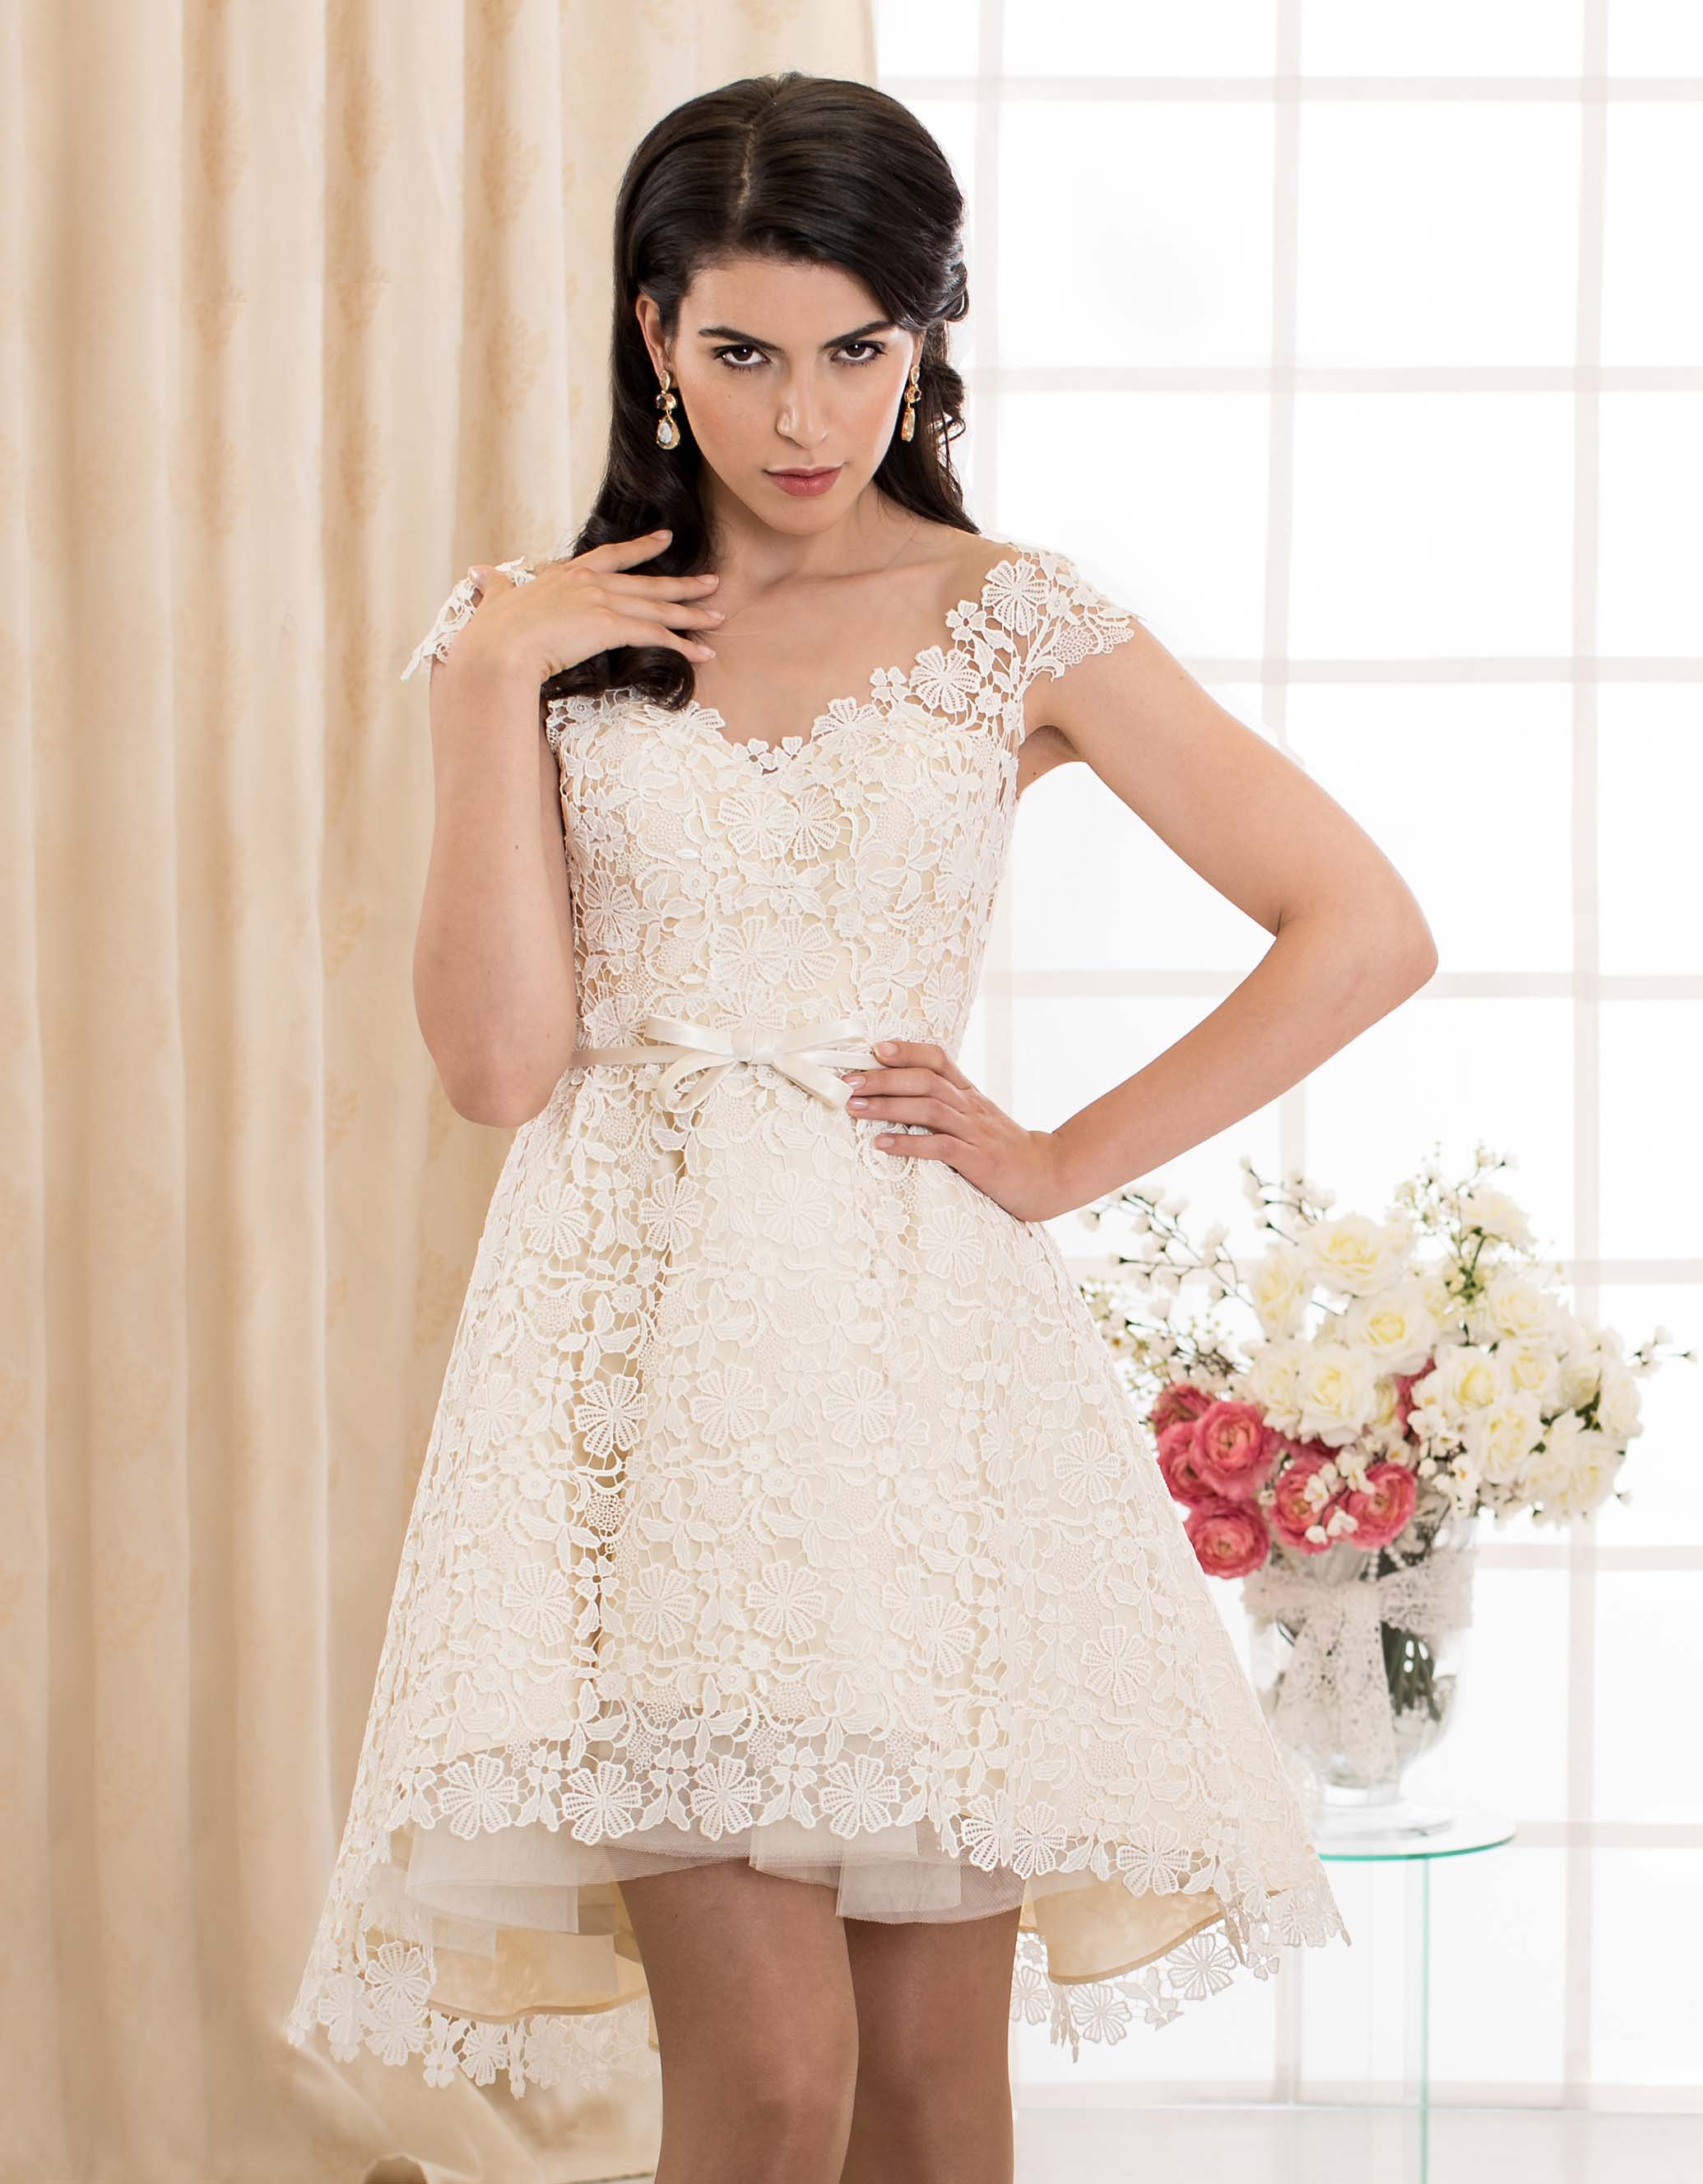 Titelbild Brautkleider Inspiration